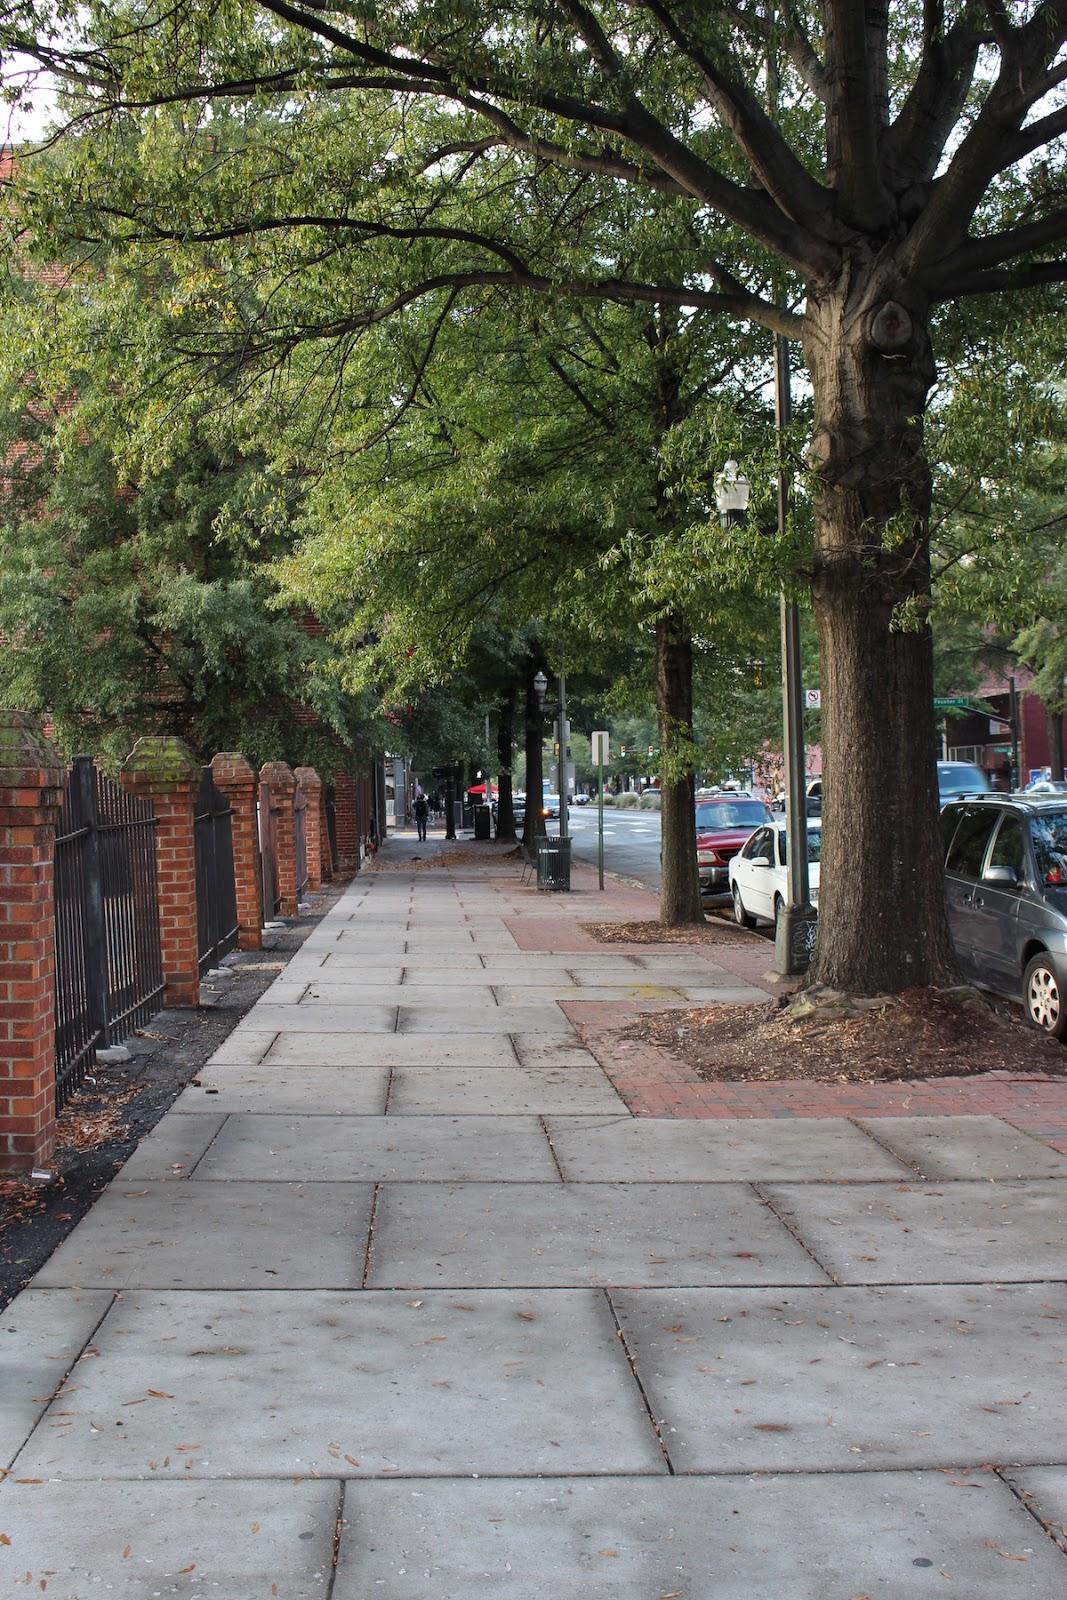 This is a street shot in Richmond Virginia.